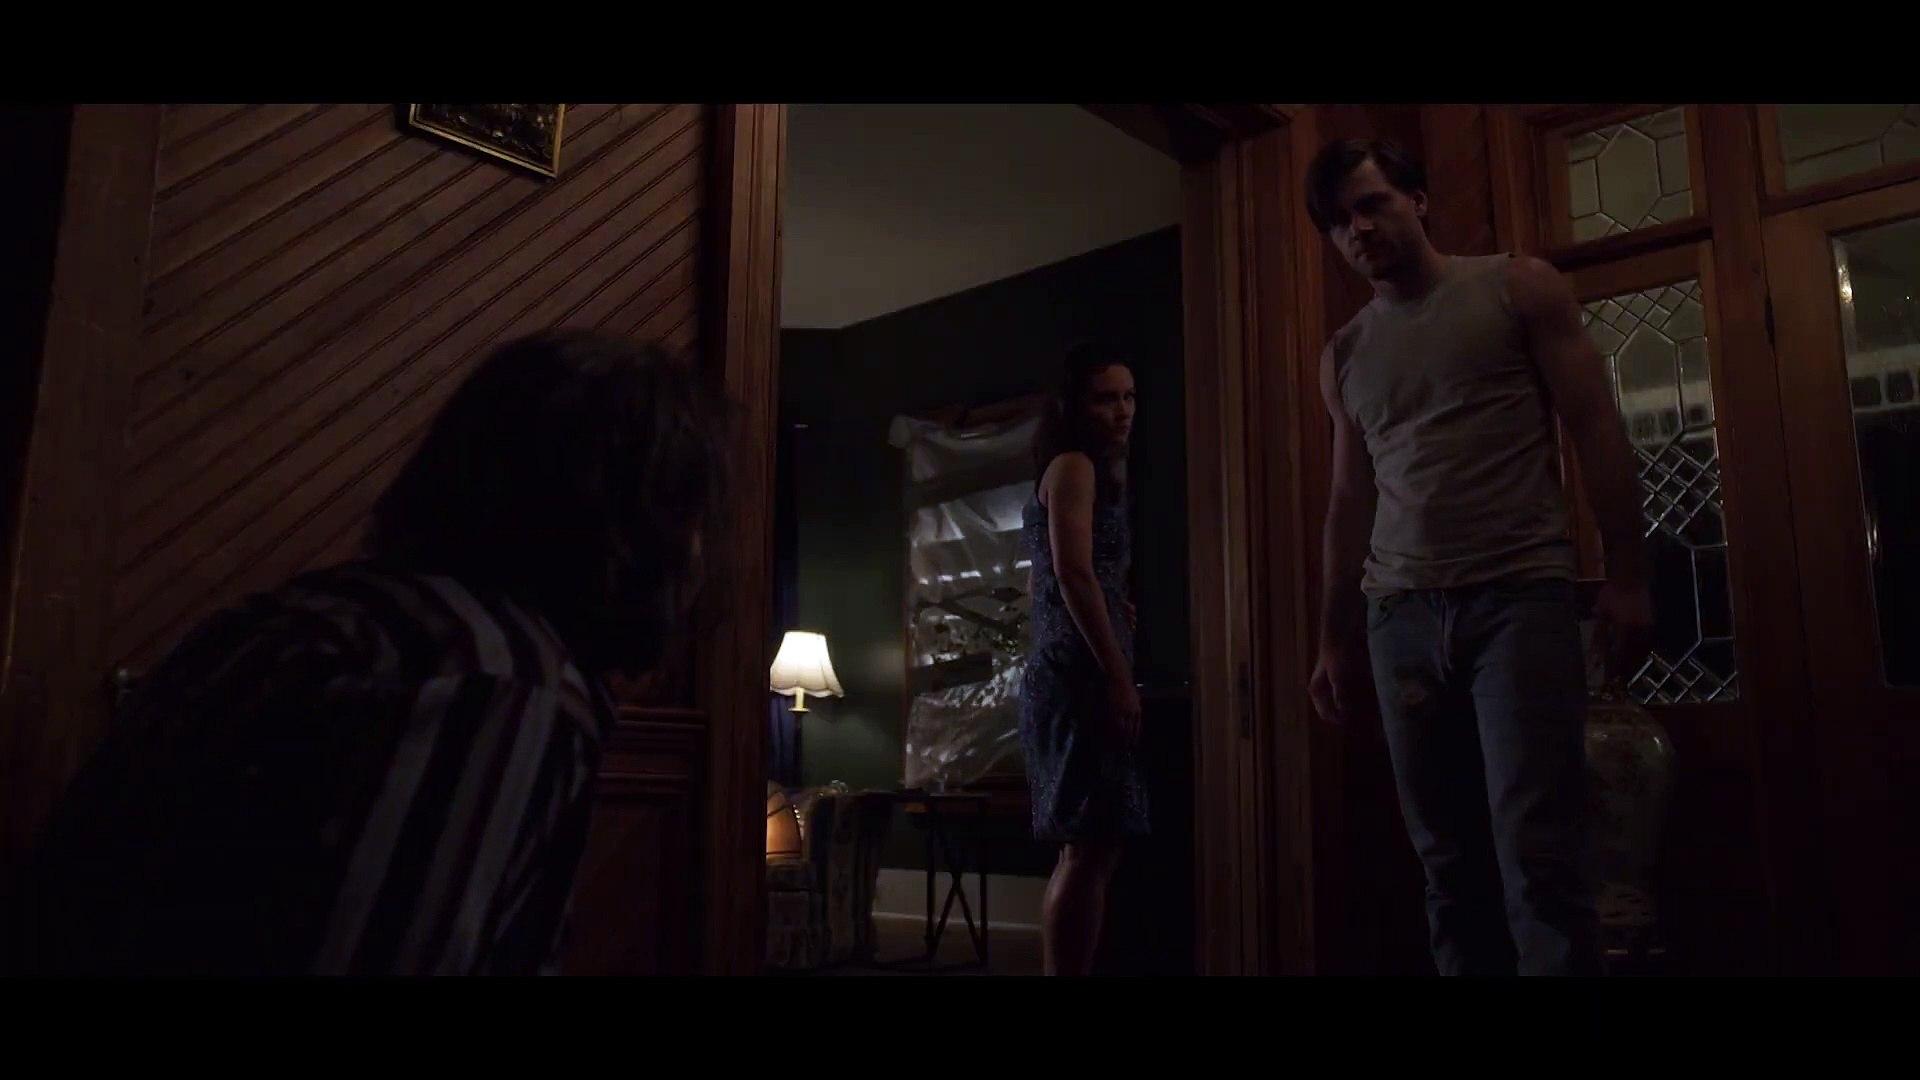 GRAND ISLE movie clip - Basement - Nicolas Cage - video dailymotion